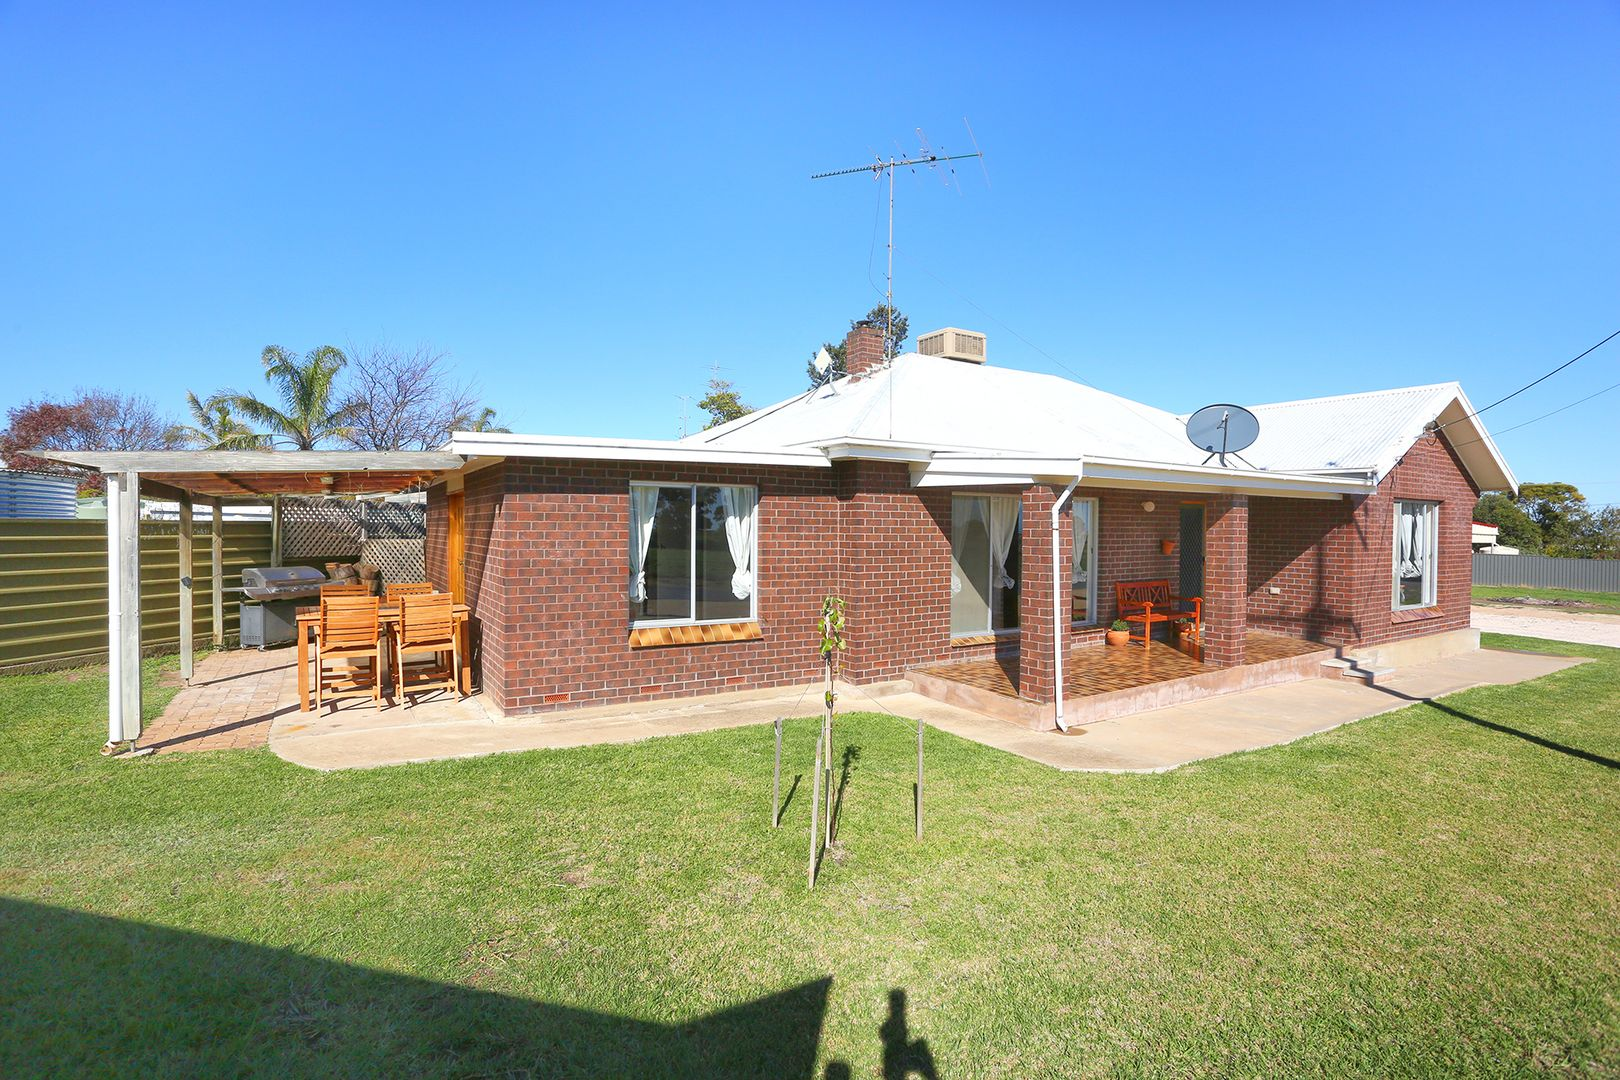 6-8 Seaview Road, Maitland SA 5573, Image 2